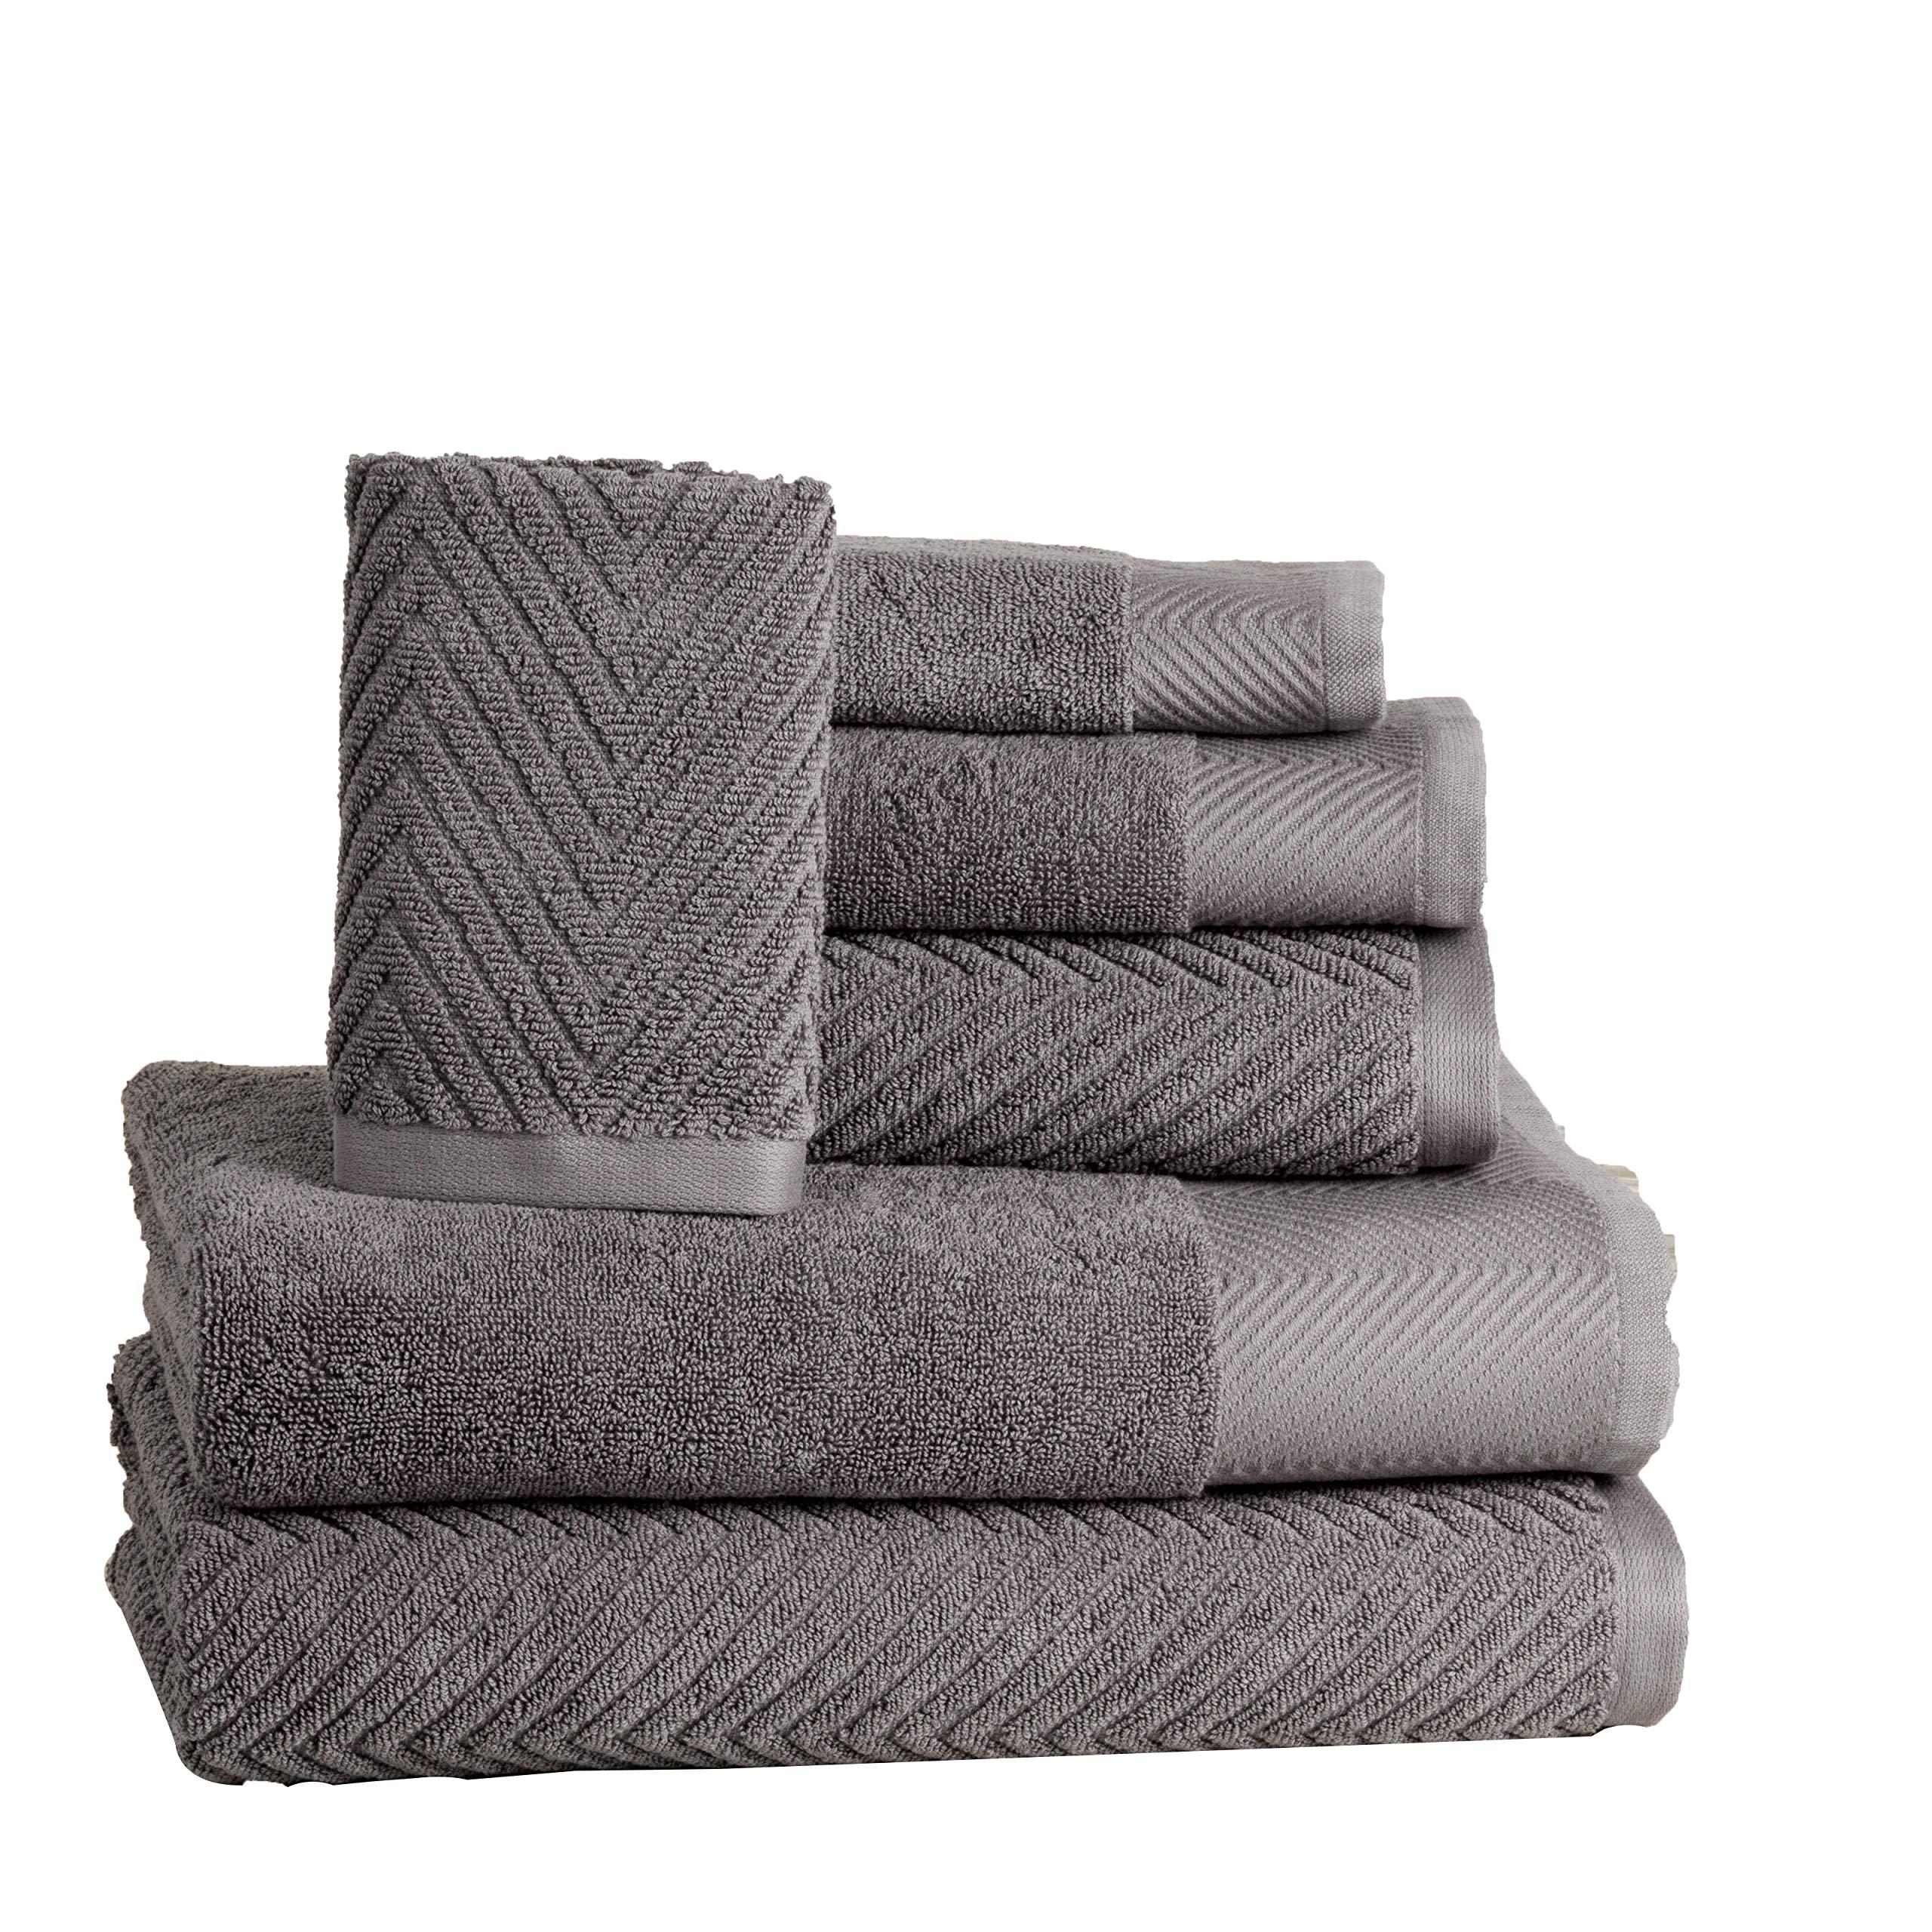 ISABELLA CROMWELL 6 Piece Premium Cotton Bath Towels Set - 2 Bath Towels, 2 Hand Towels, 2 Washcloths Machine Washable Super Absorbent Hotel Spa Quality Luxury Towel Gift Sets Chevron Towel Set- Grey